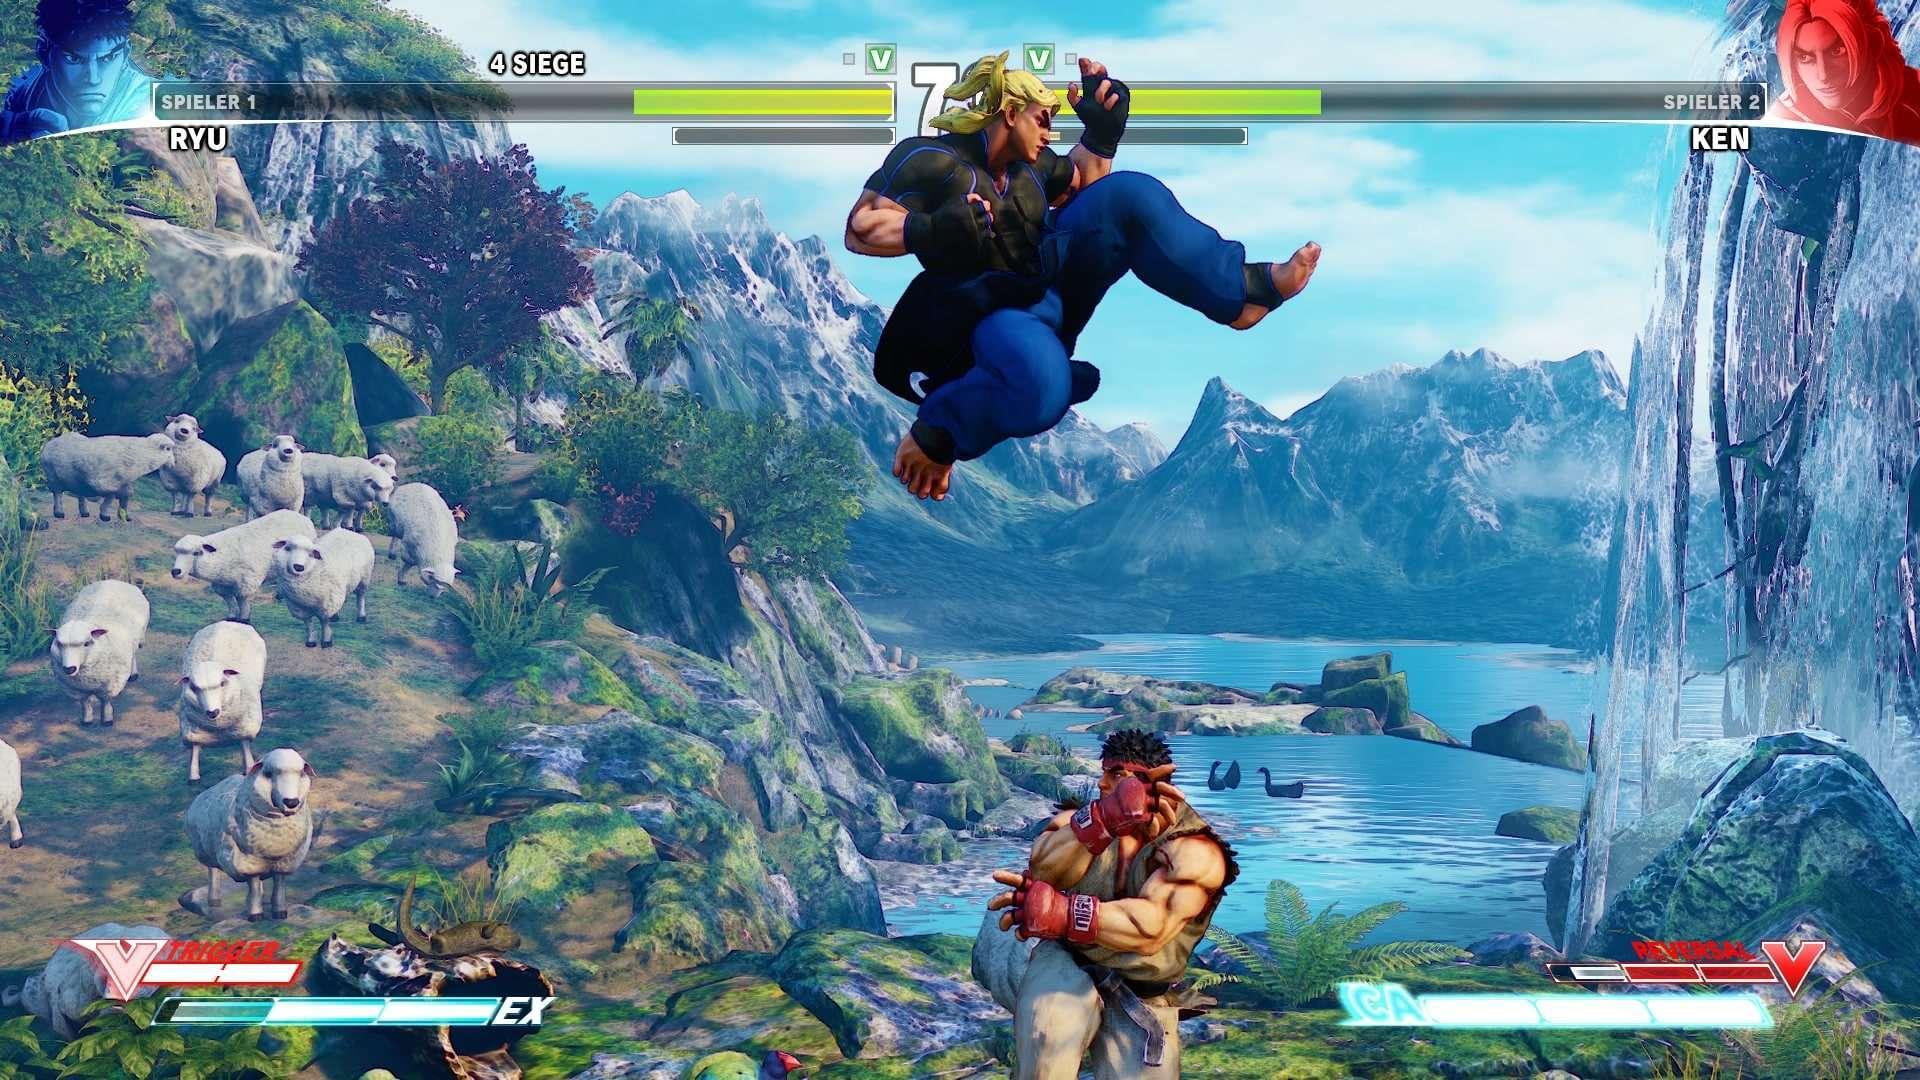 Hadoken strikes again – Street Fighter V (PS4) kurz angespielt 6 techboys.de • smarte News, auf den Punkt! Hadoken strikes again – Street Fighter V (PS4) kurz angespielt